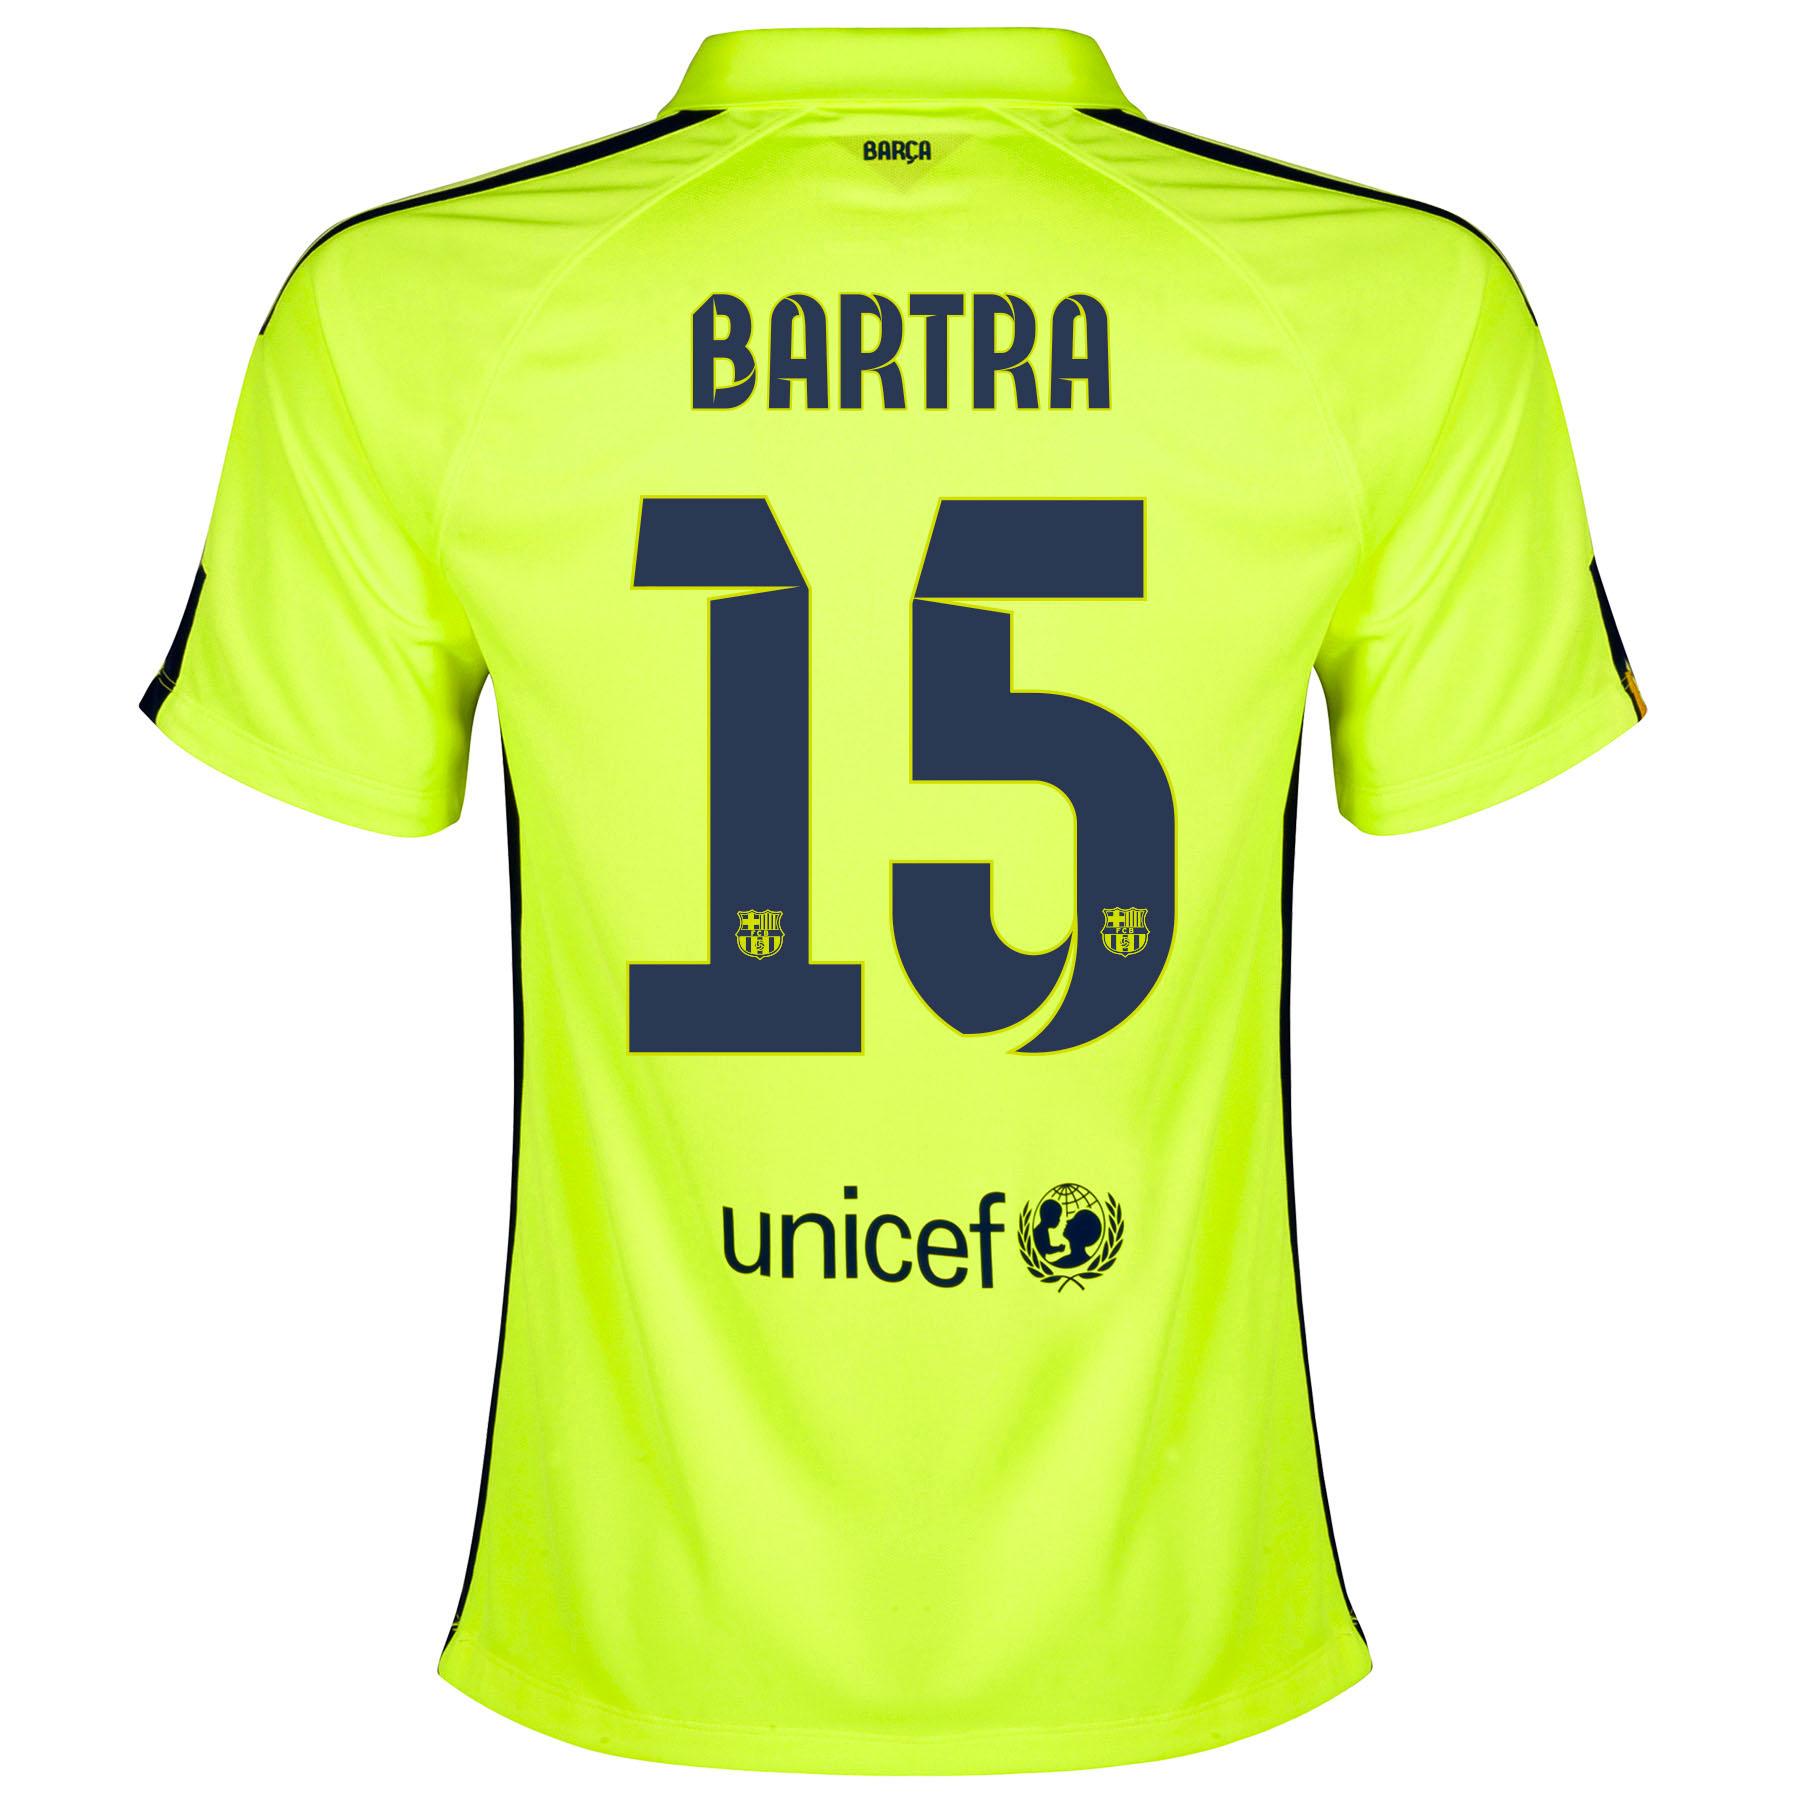 Barcelona Third Shirt 2014/15 - Womens Yellow with Bartra 15 printing